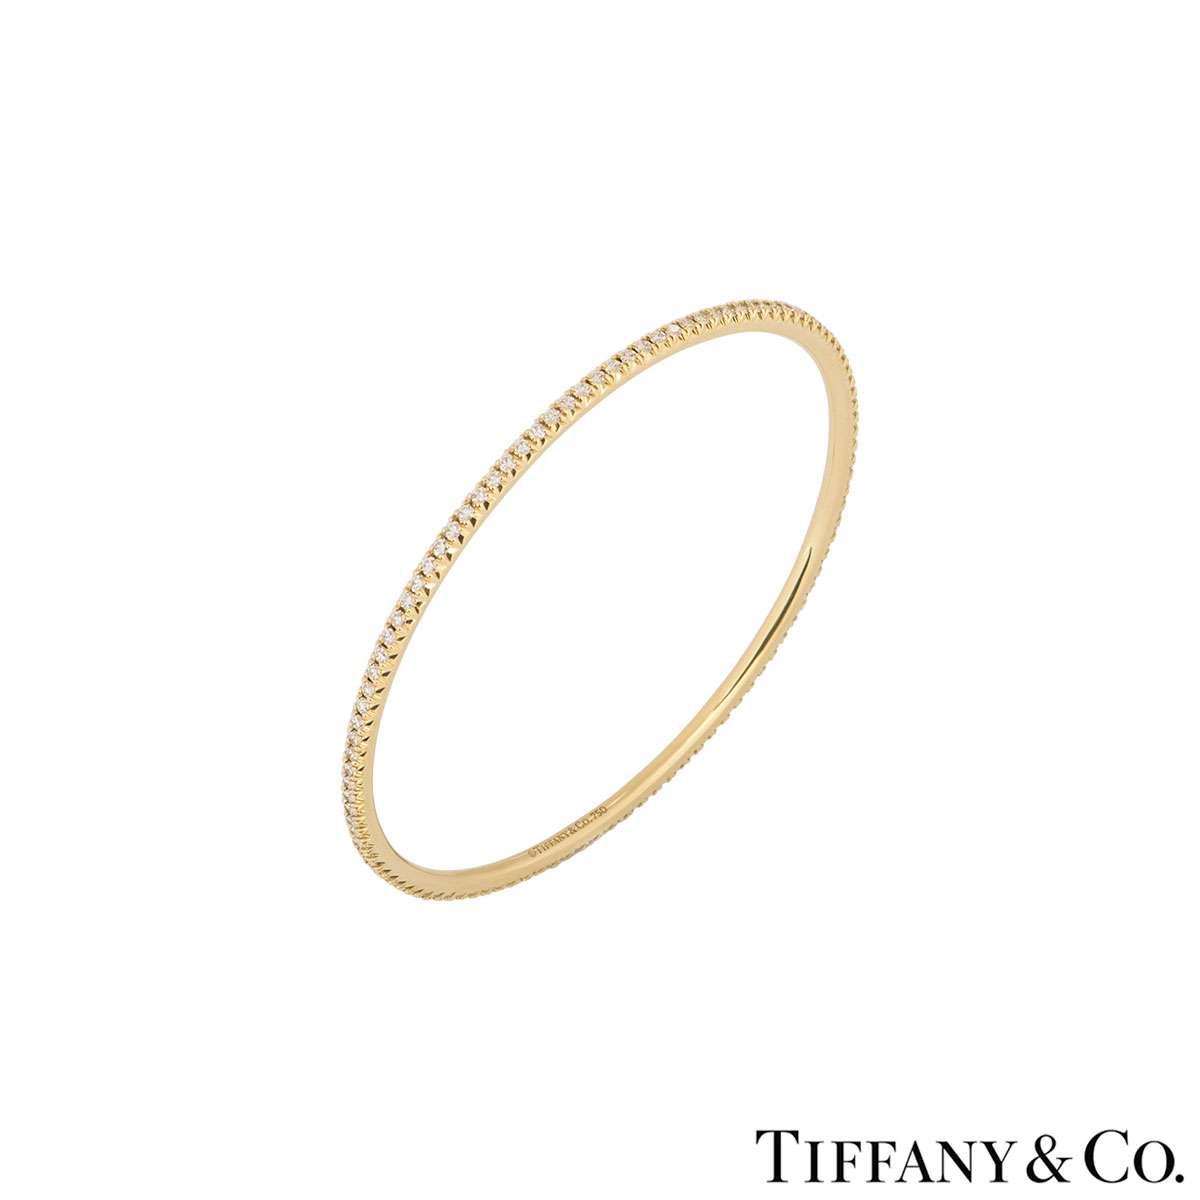 Tiffany & Co. 18k Yellow Gold Diamond Metro Bangle 1.59ct